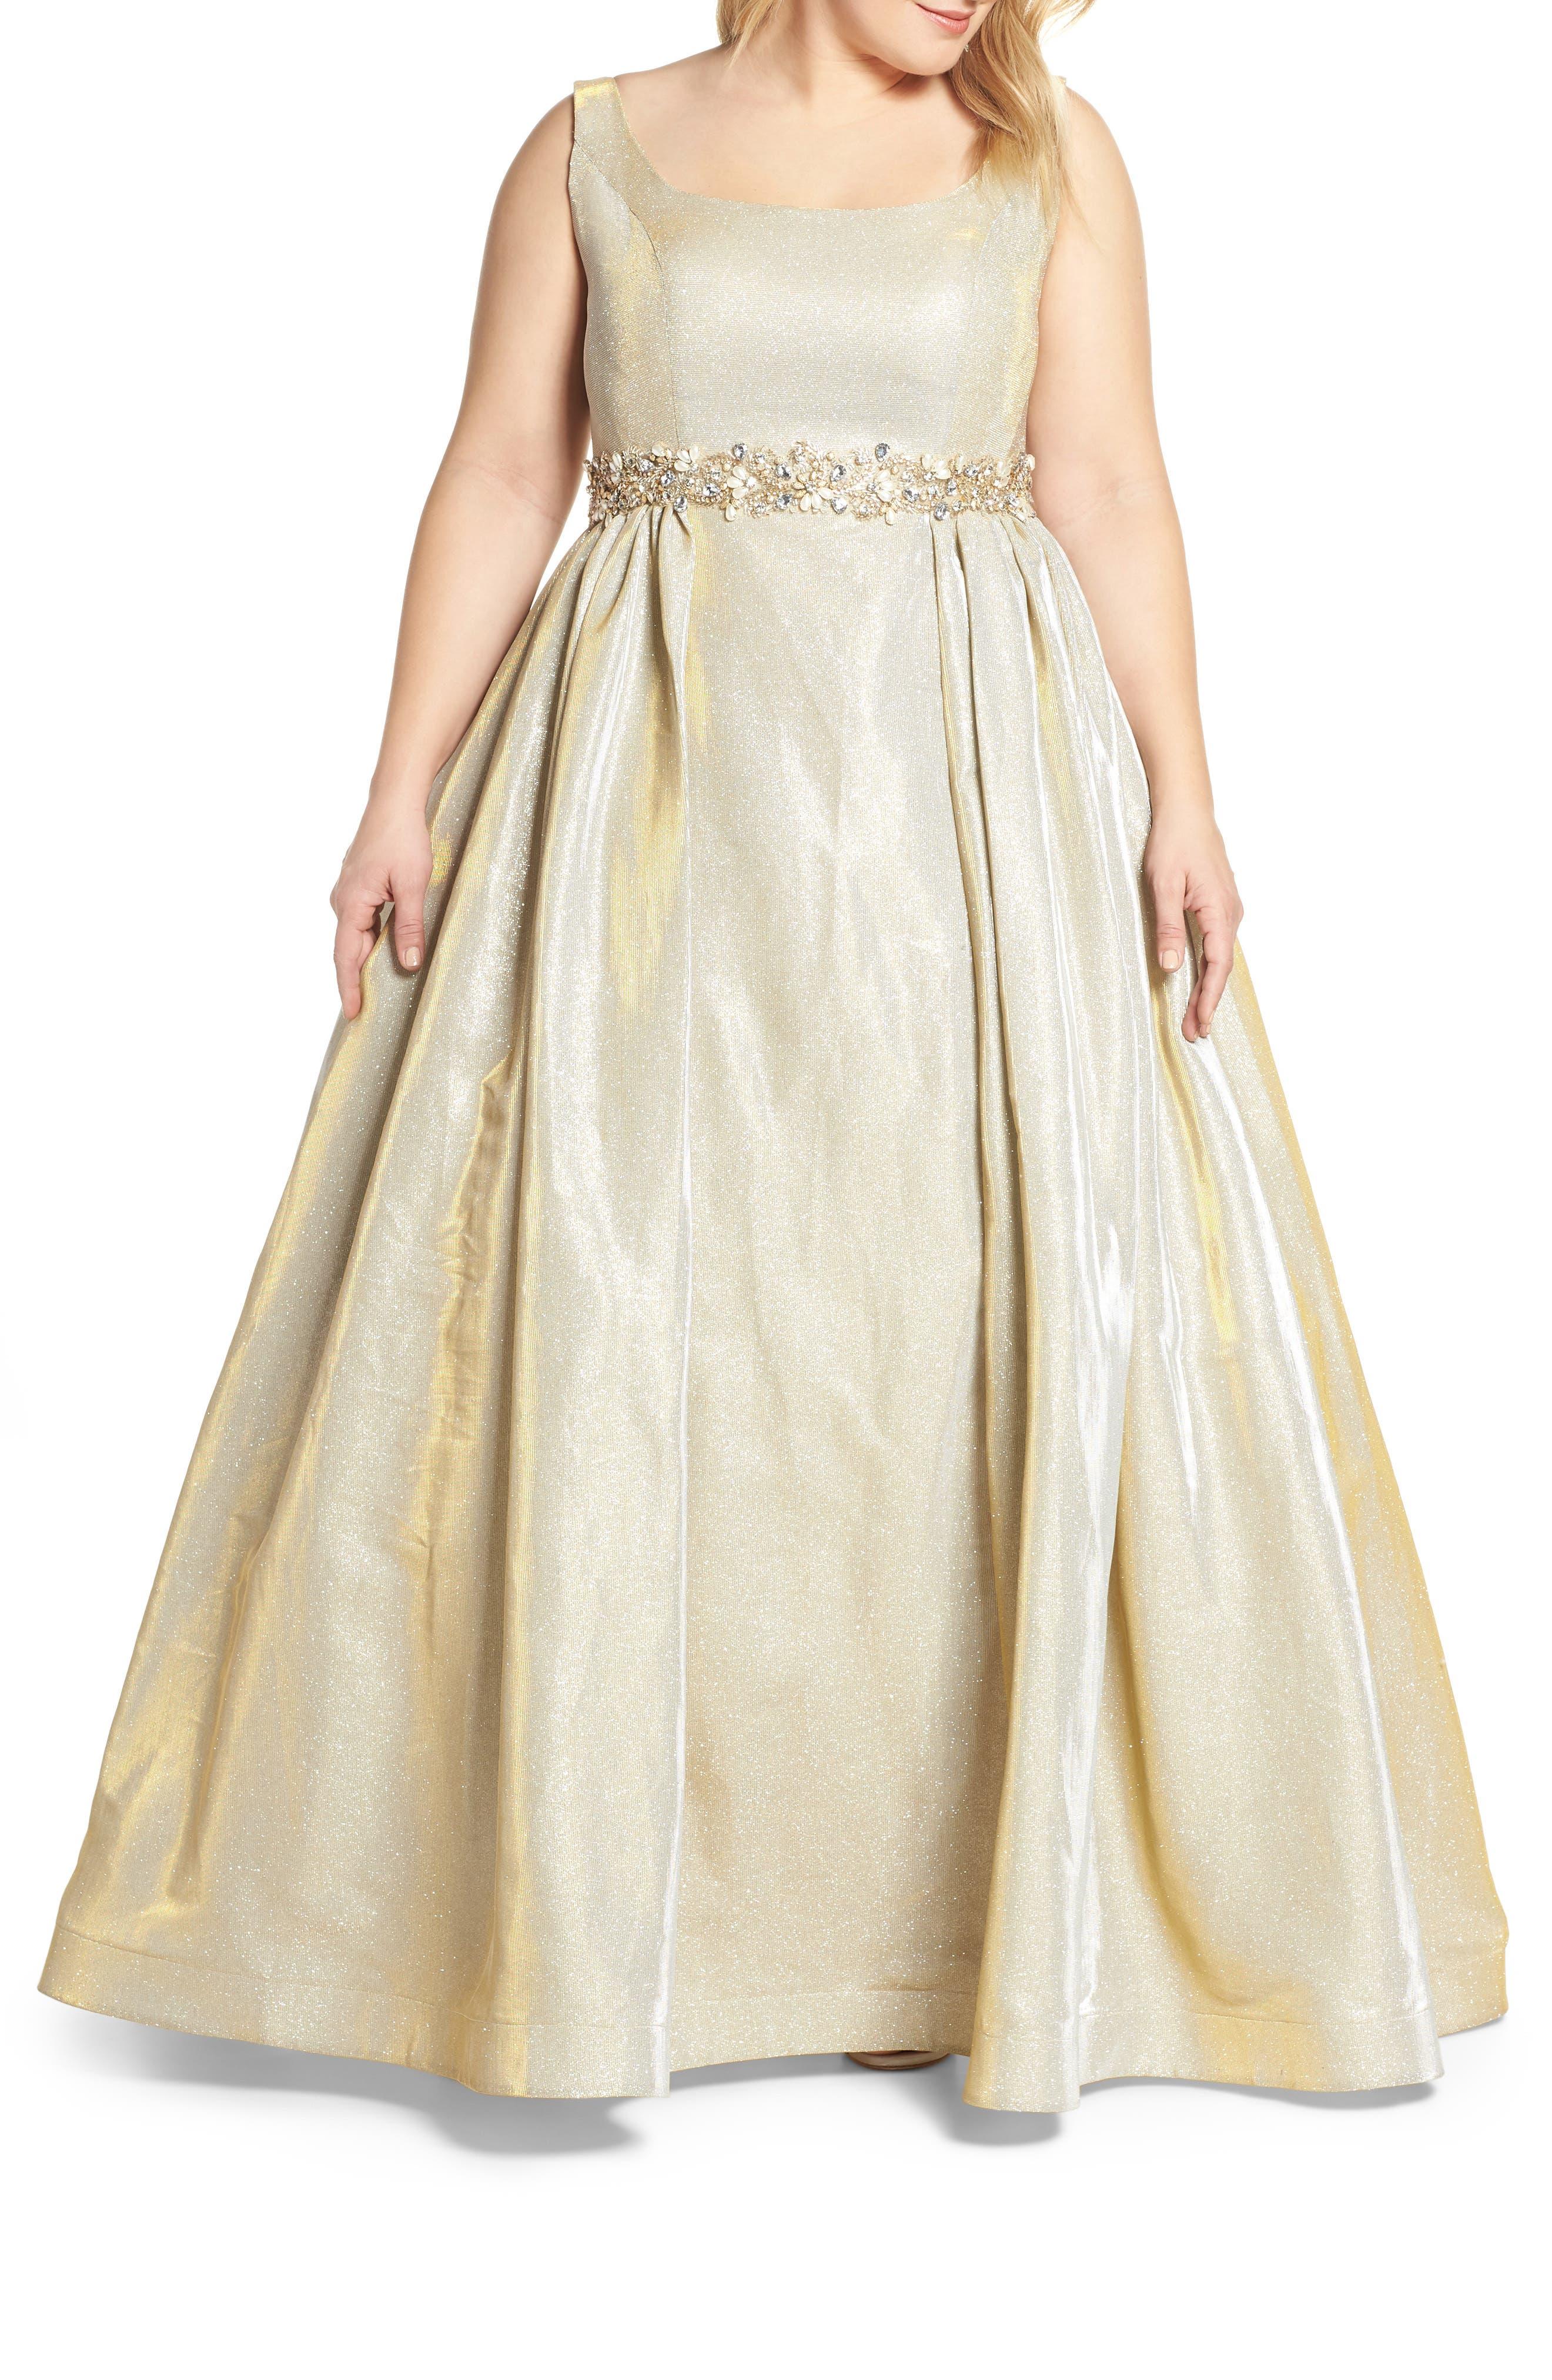 Plus Size MAC Duggal Jeweled Waist Metallic Evening Dress, Yellow